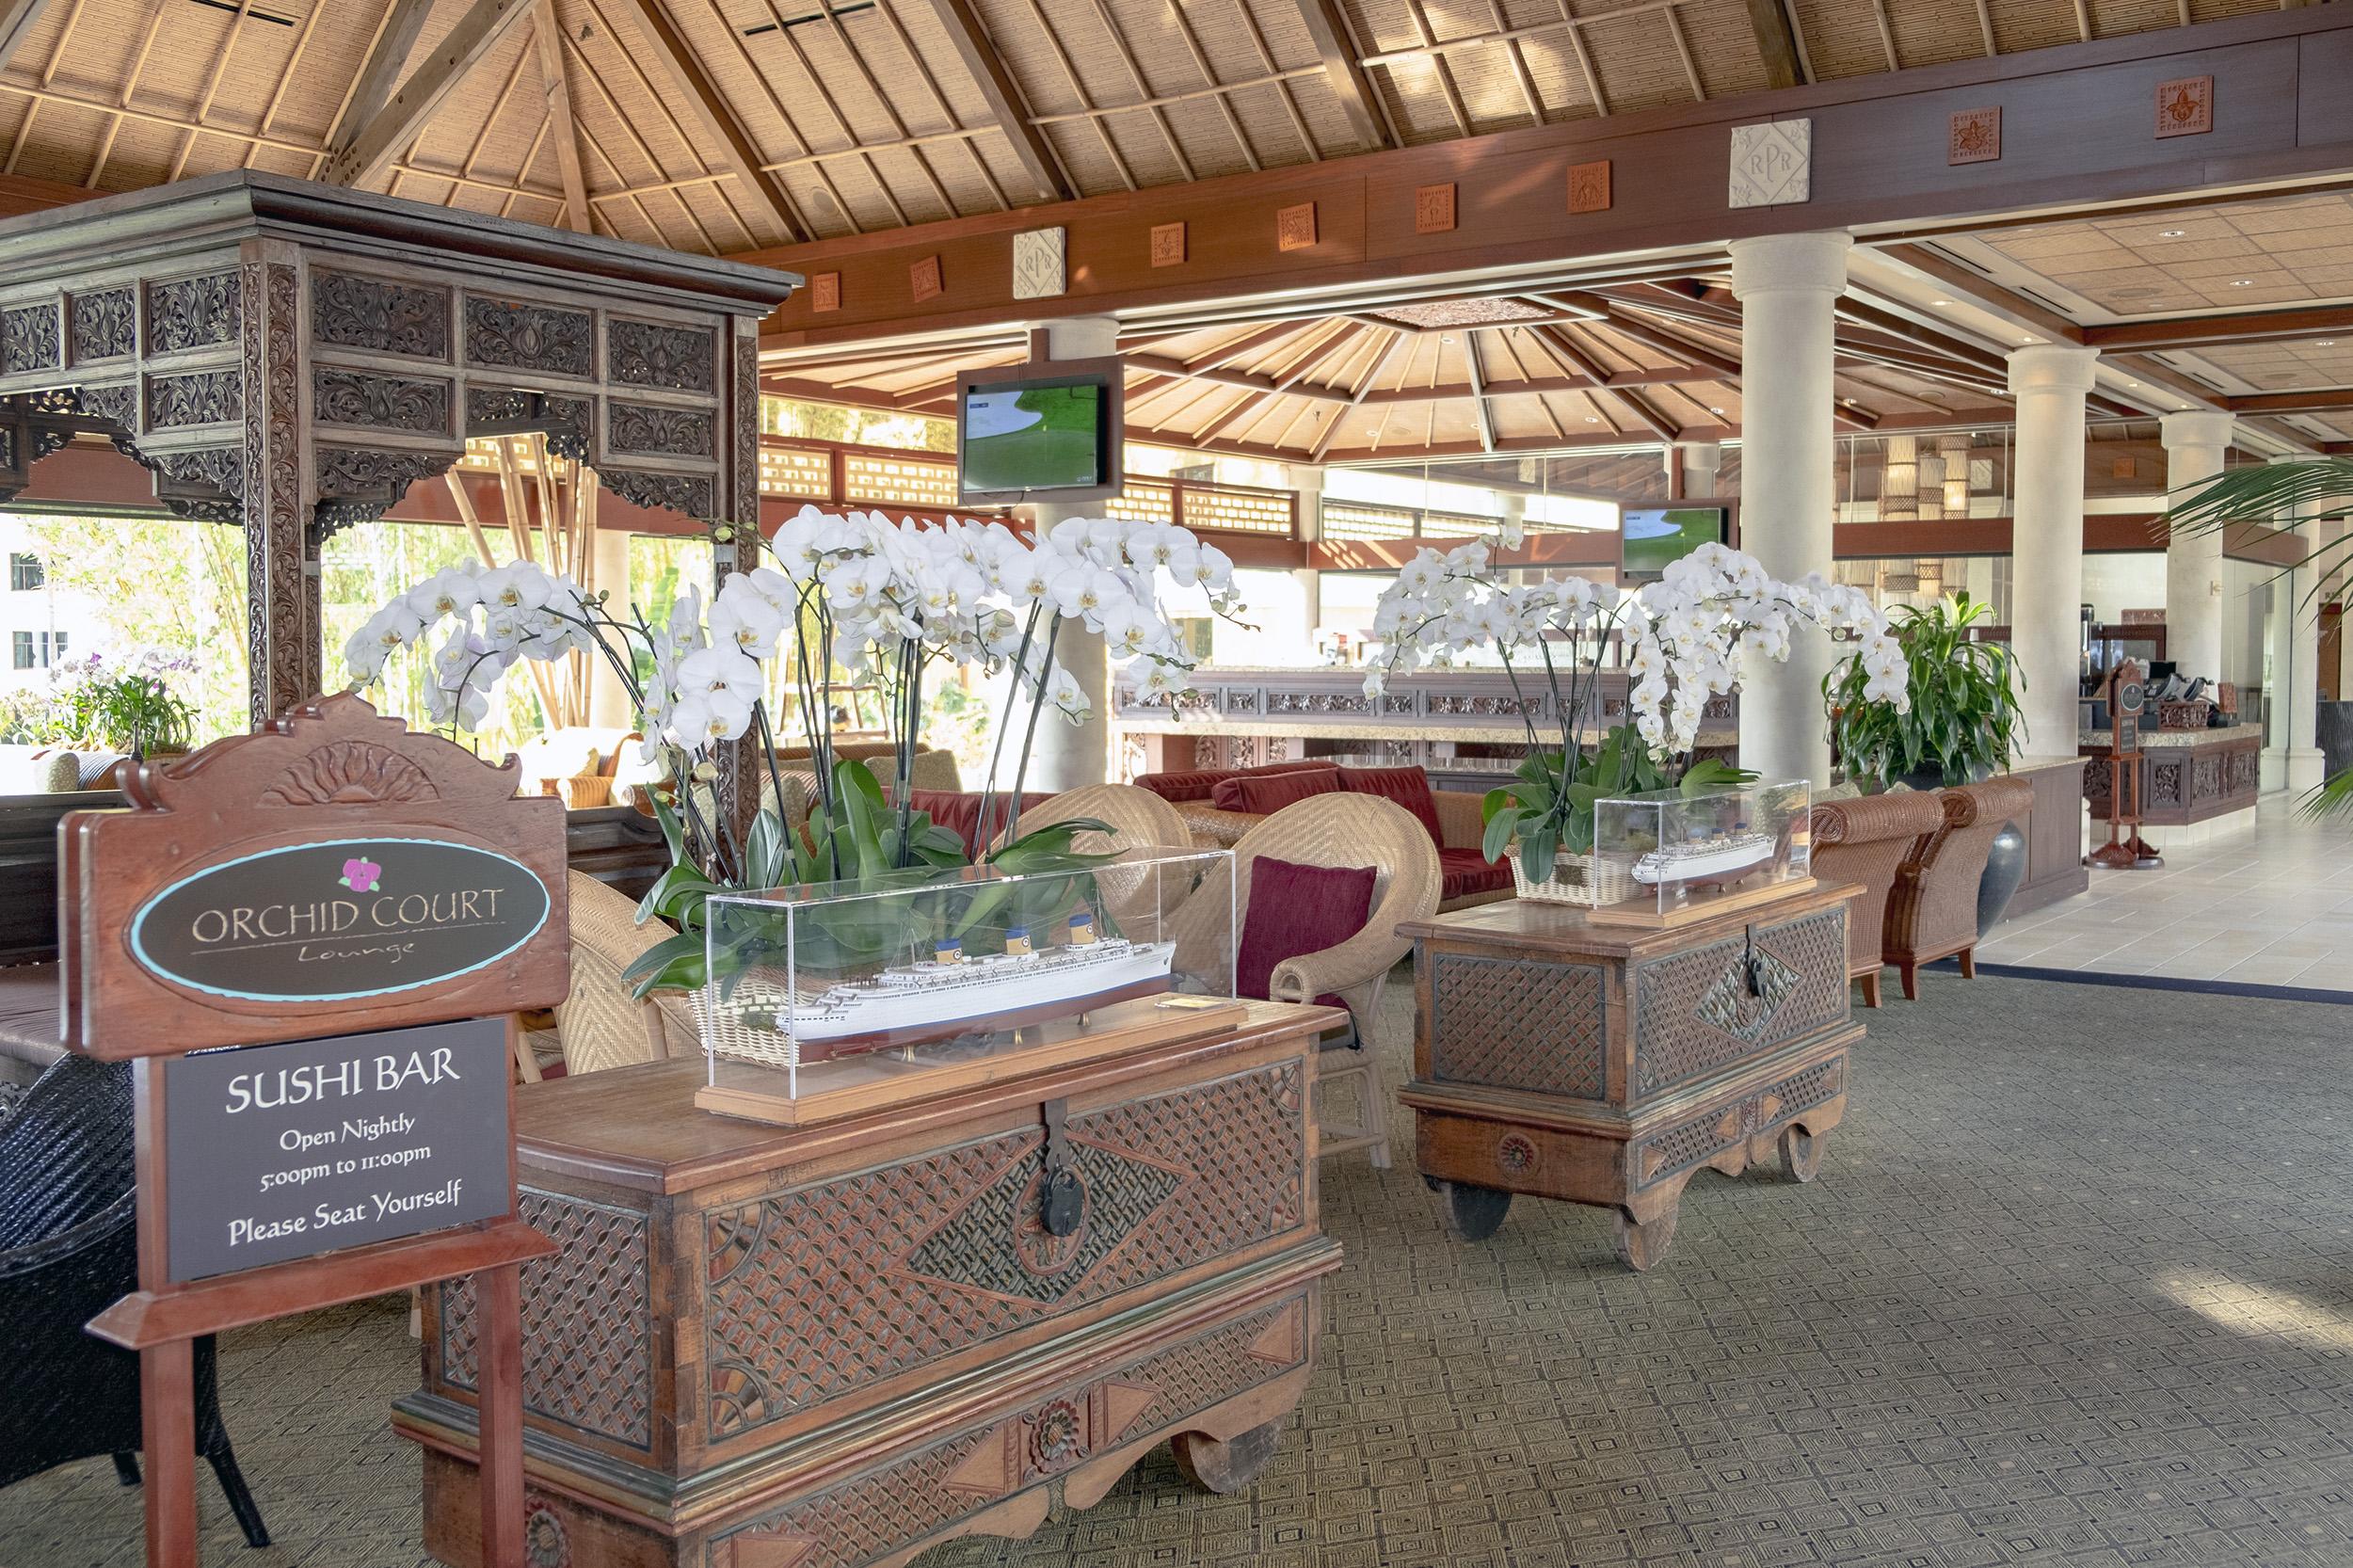 Loews Royal Pacific Resort Universal Orlando Citywalk Orchid Court Sushi Bar